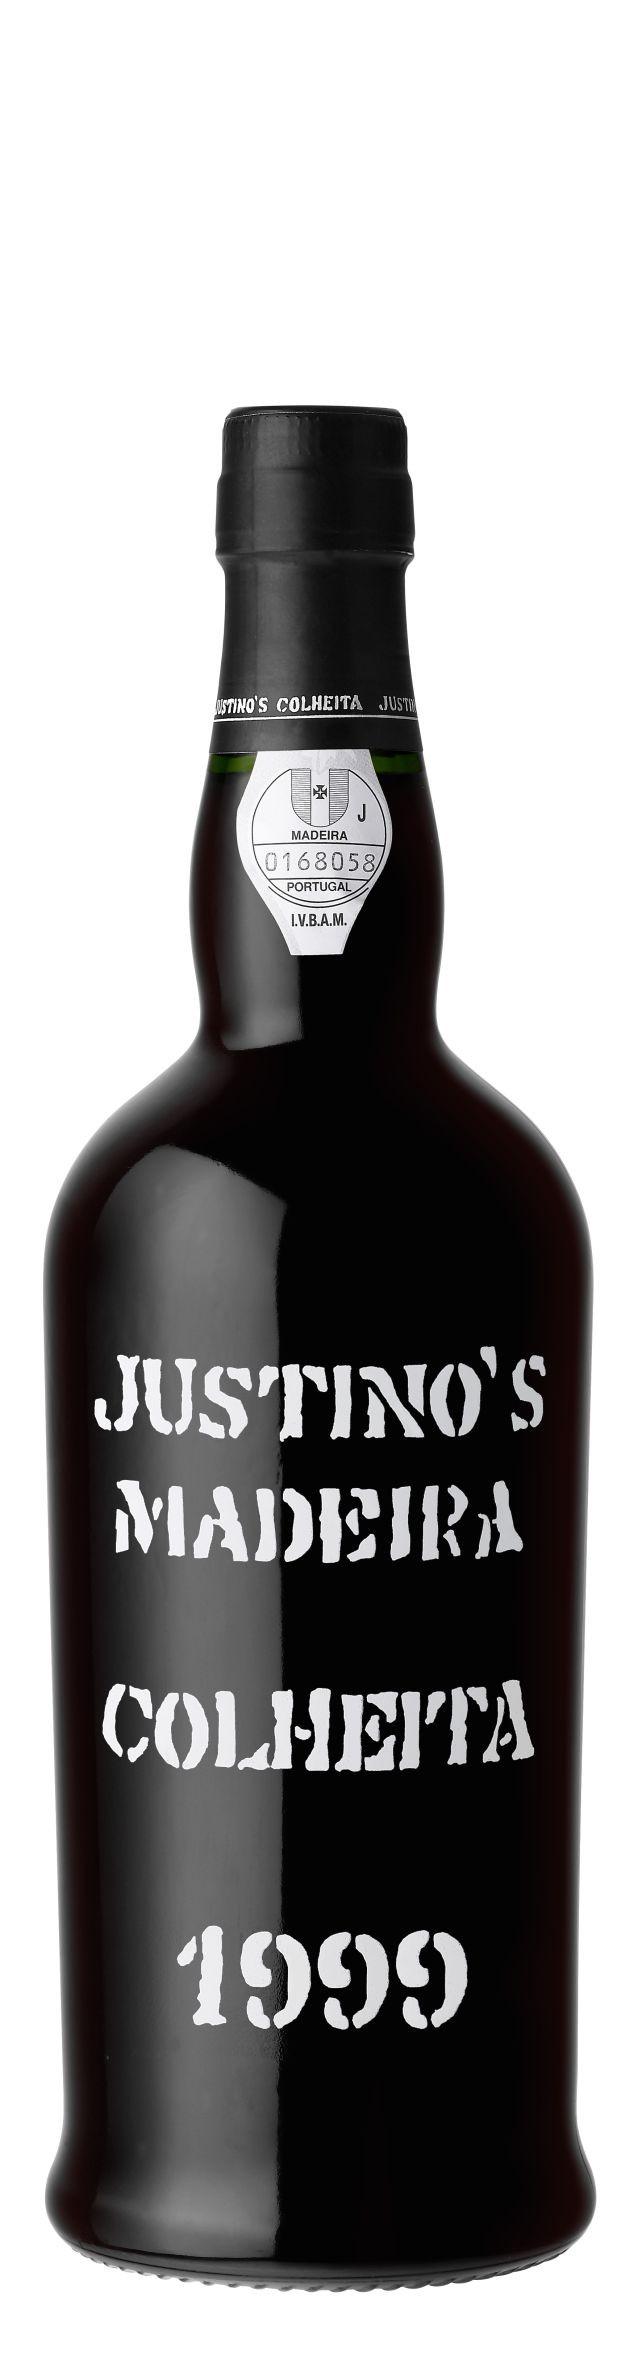 Justino's Madeira Colheita (sweet) 19° - , 1999